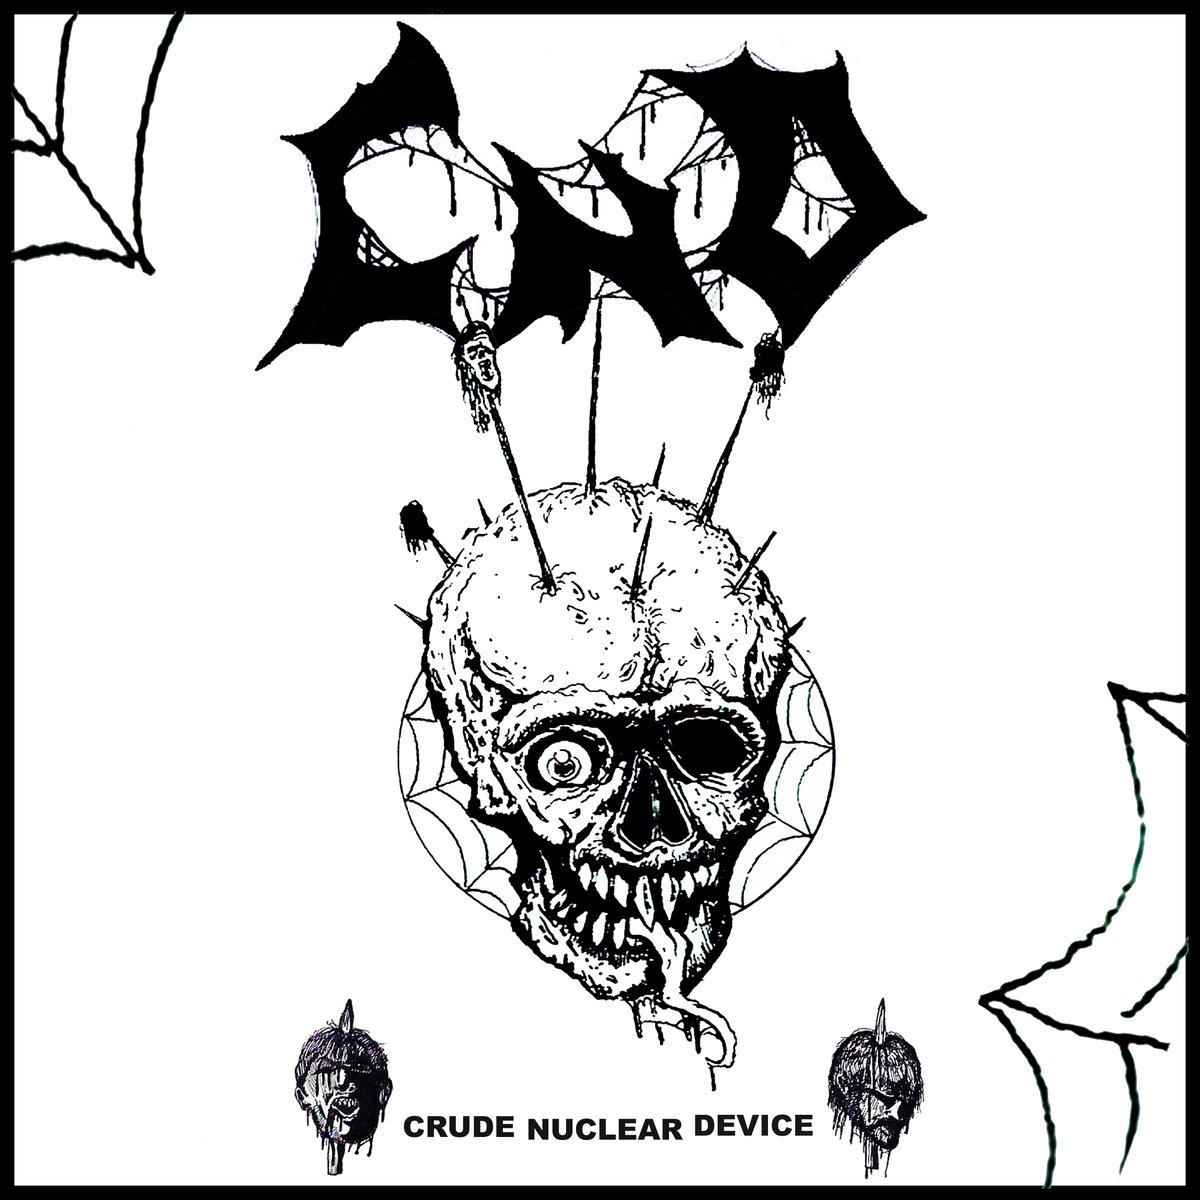 1200x1200 Crude Nuclear Device Demo C.n.d.